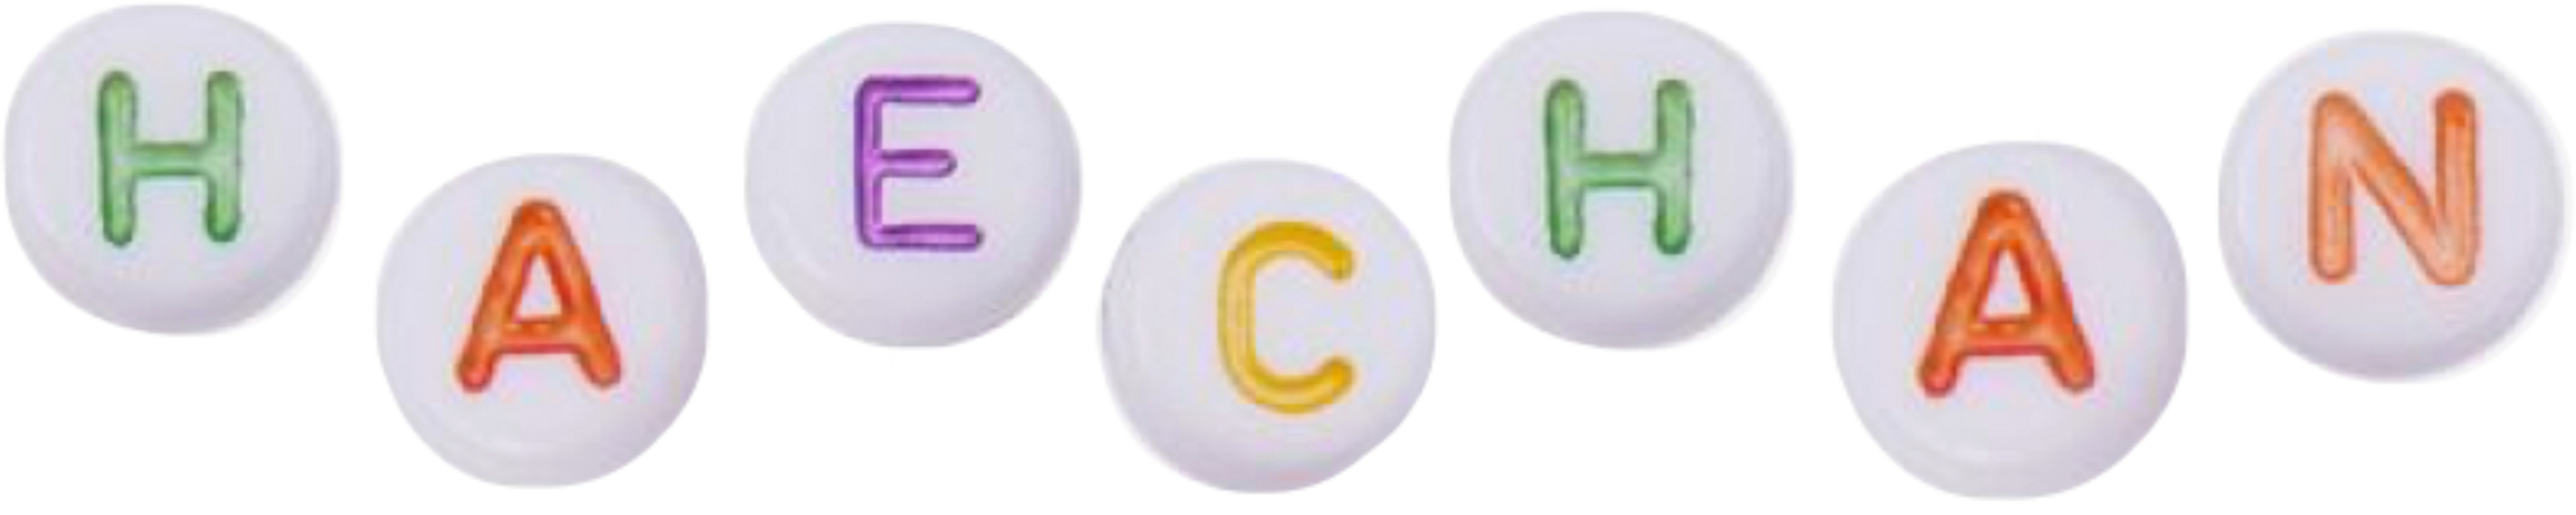 #haechan #haechanedit #nct #haechansticker #alphabet #alphabetcircles #letters #nct127 #nctdream #donghyuck #haechannct #aestheticnct #nctsticker #nctedit #ncticon #haechanicon #freetoedit #kpop #edit #icon #aesthetic